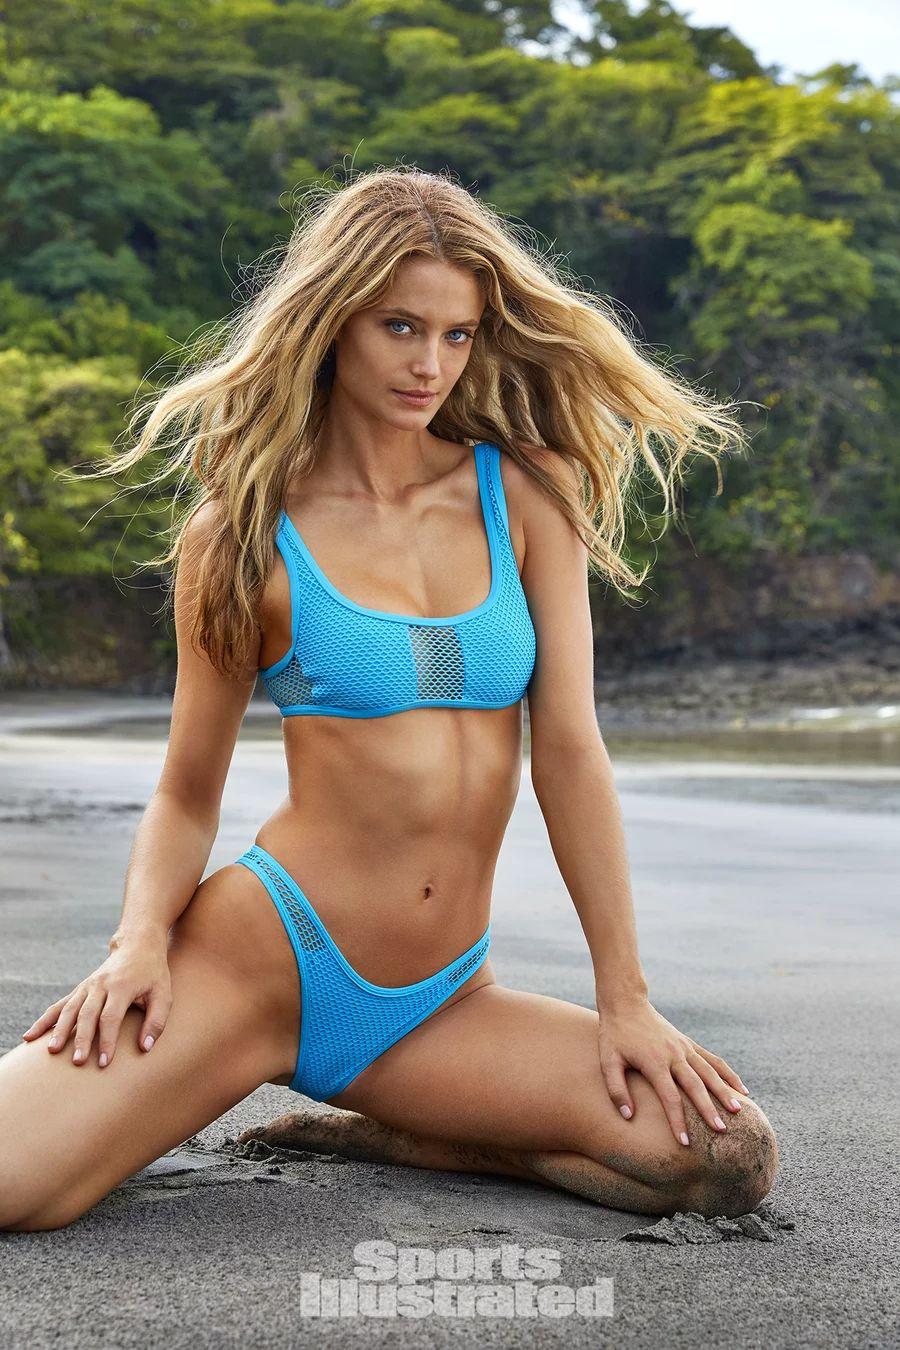 0409071015394_06_Kate-Bock-Nude-Sexy-TheFappeningBlog.com-7.jpg